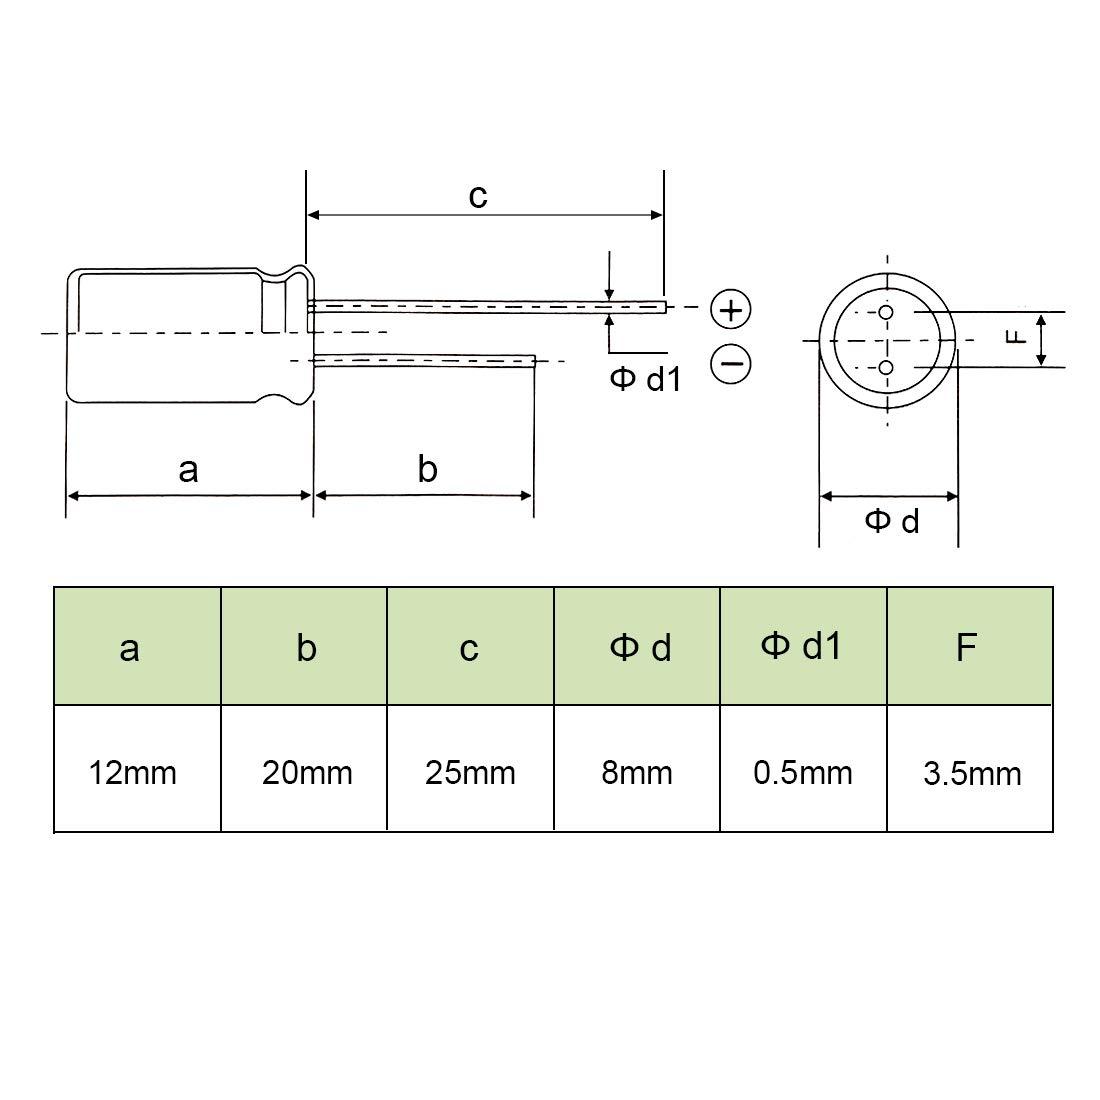 sourcing map 20stk Aluminium Radial Elektrolytkondensator 1000uF 16V Life 8 x 16 mm Schwarz de